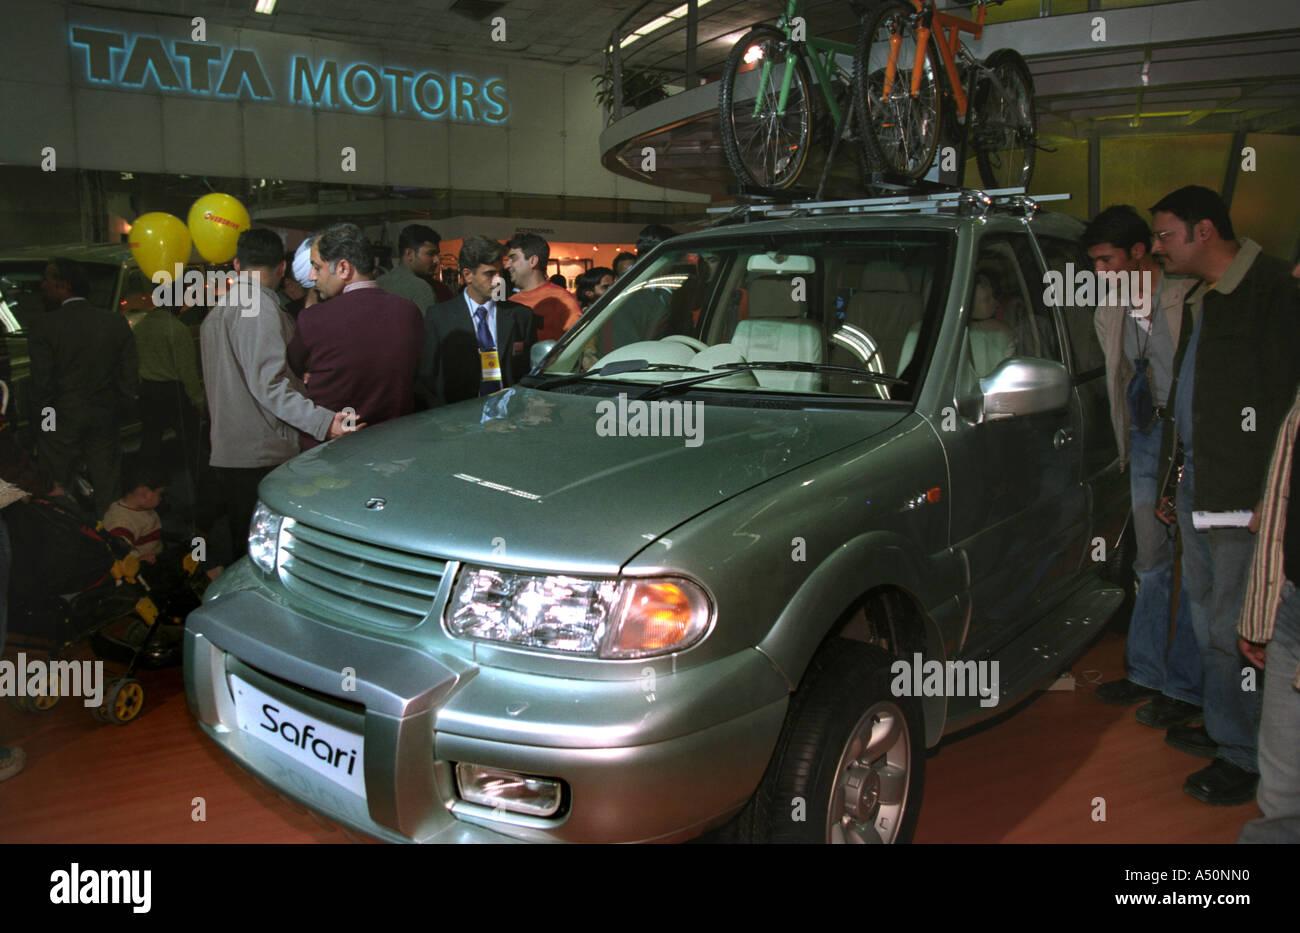 Tata Safari Car On Display At Auto Expo Stock Photo 6376463 Alamy